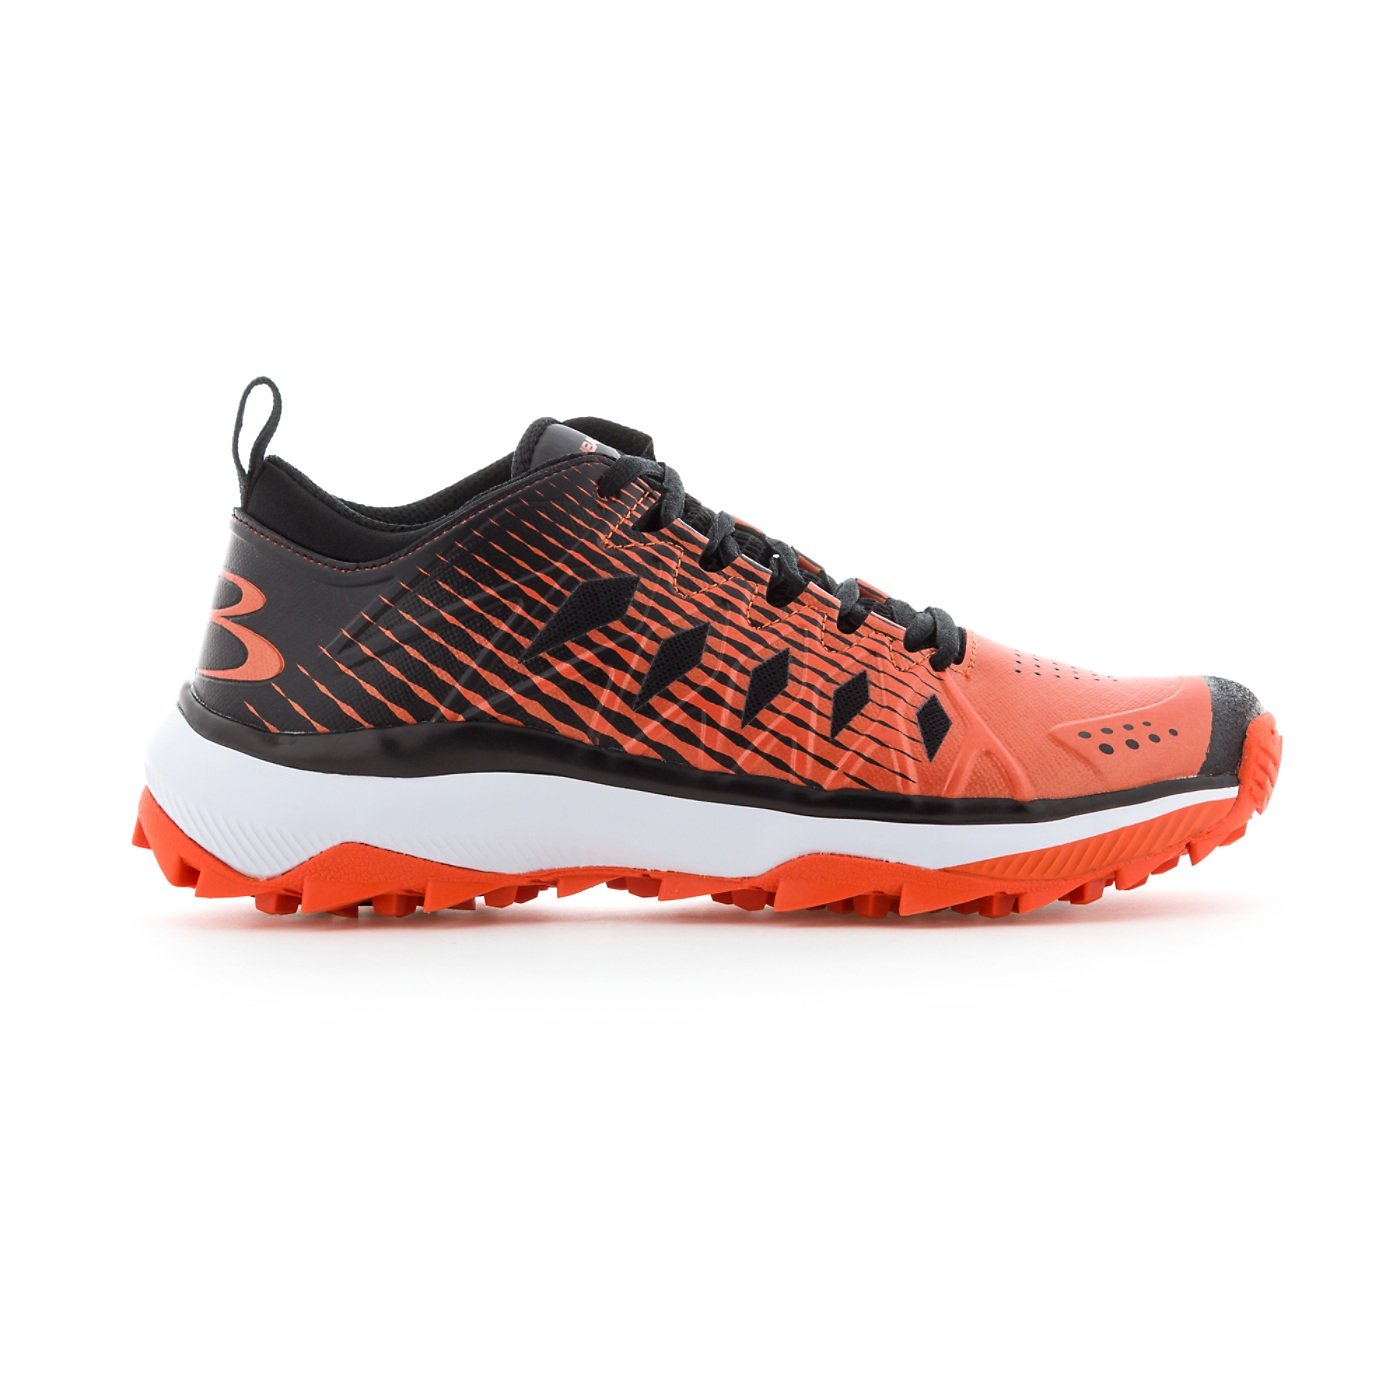 Boombah Women's Squadron Turf Shoes - 14 Color Options - Multiple Sizes B079K2SCR1 6.5|Black/Orange